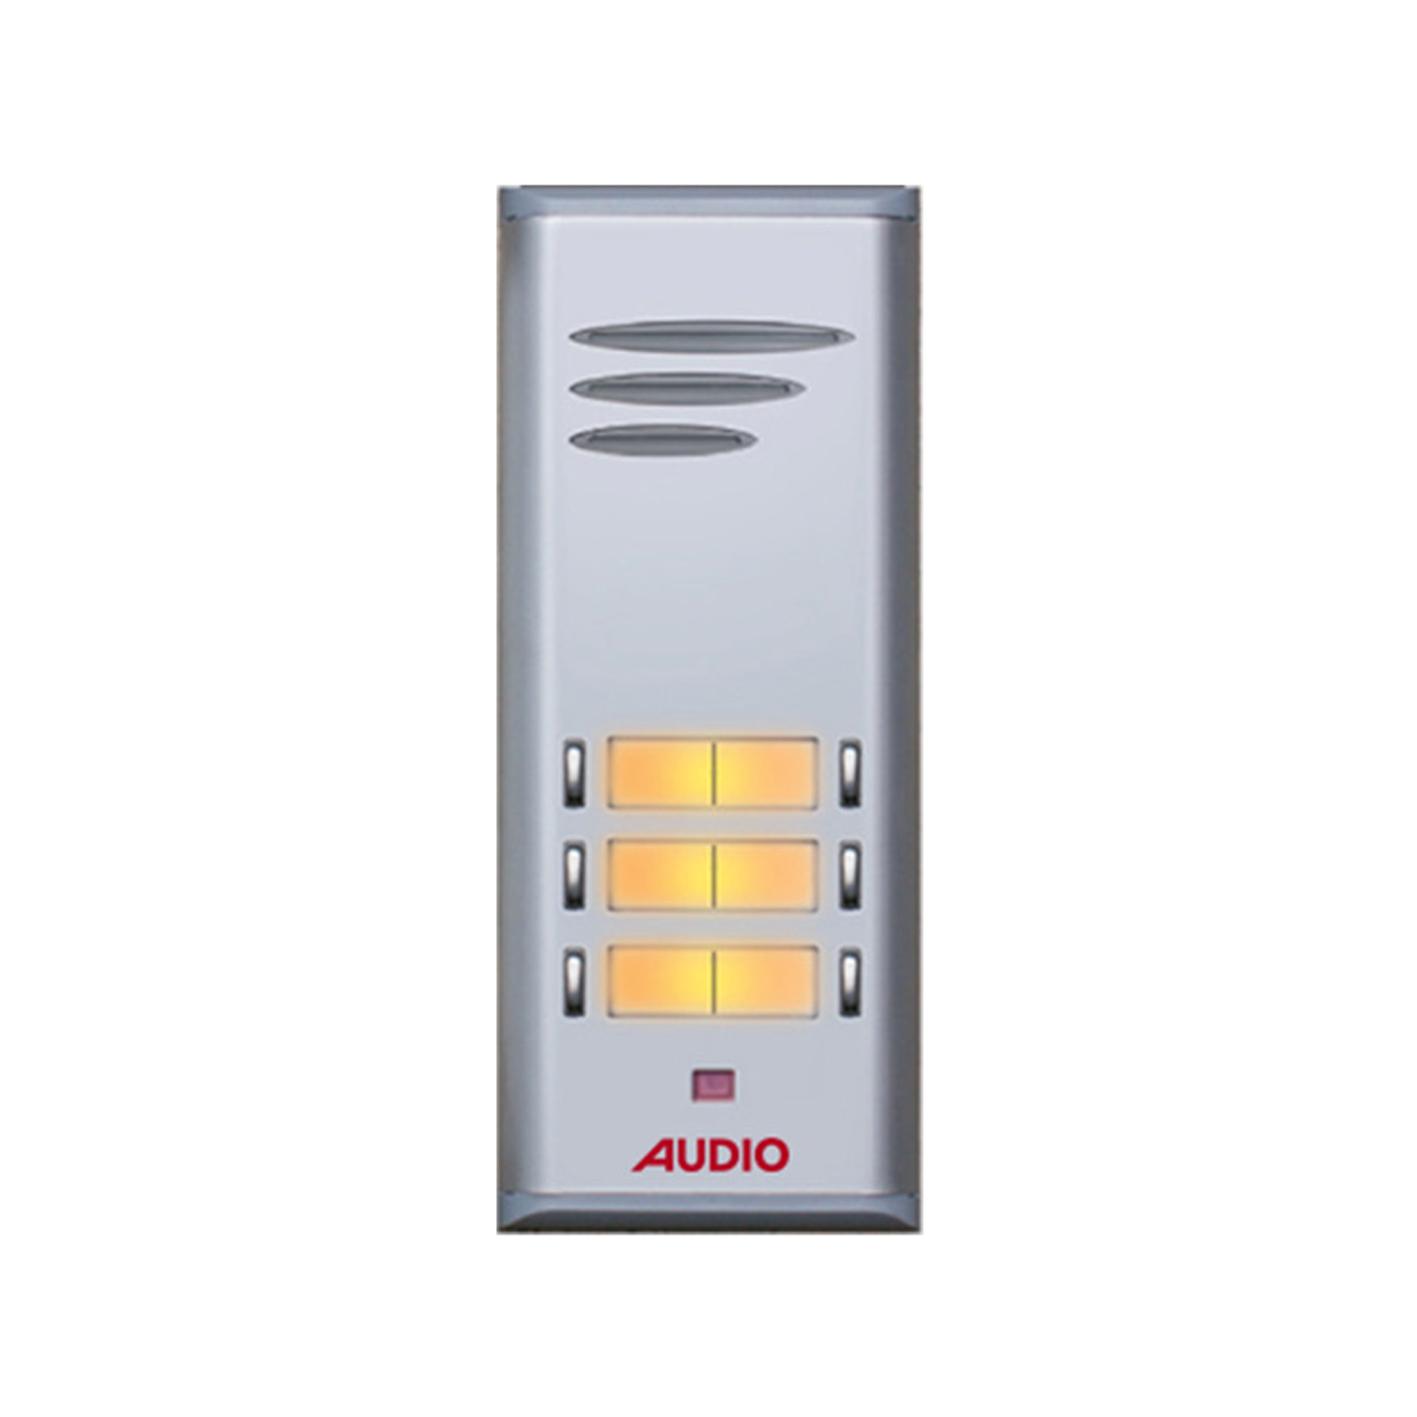 Audio 6'lı HP'li Çift Sıra Zil Paneli